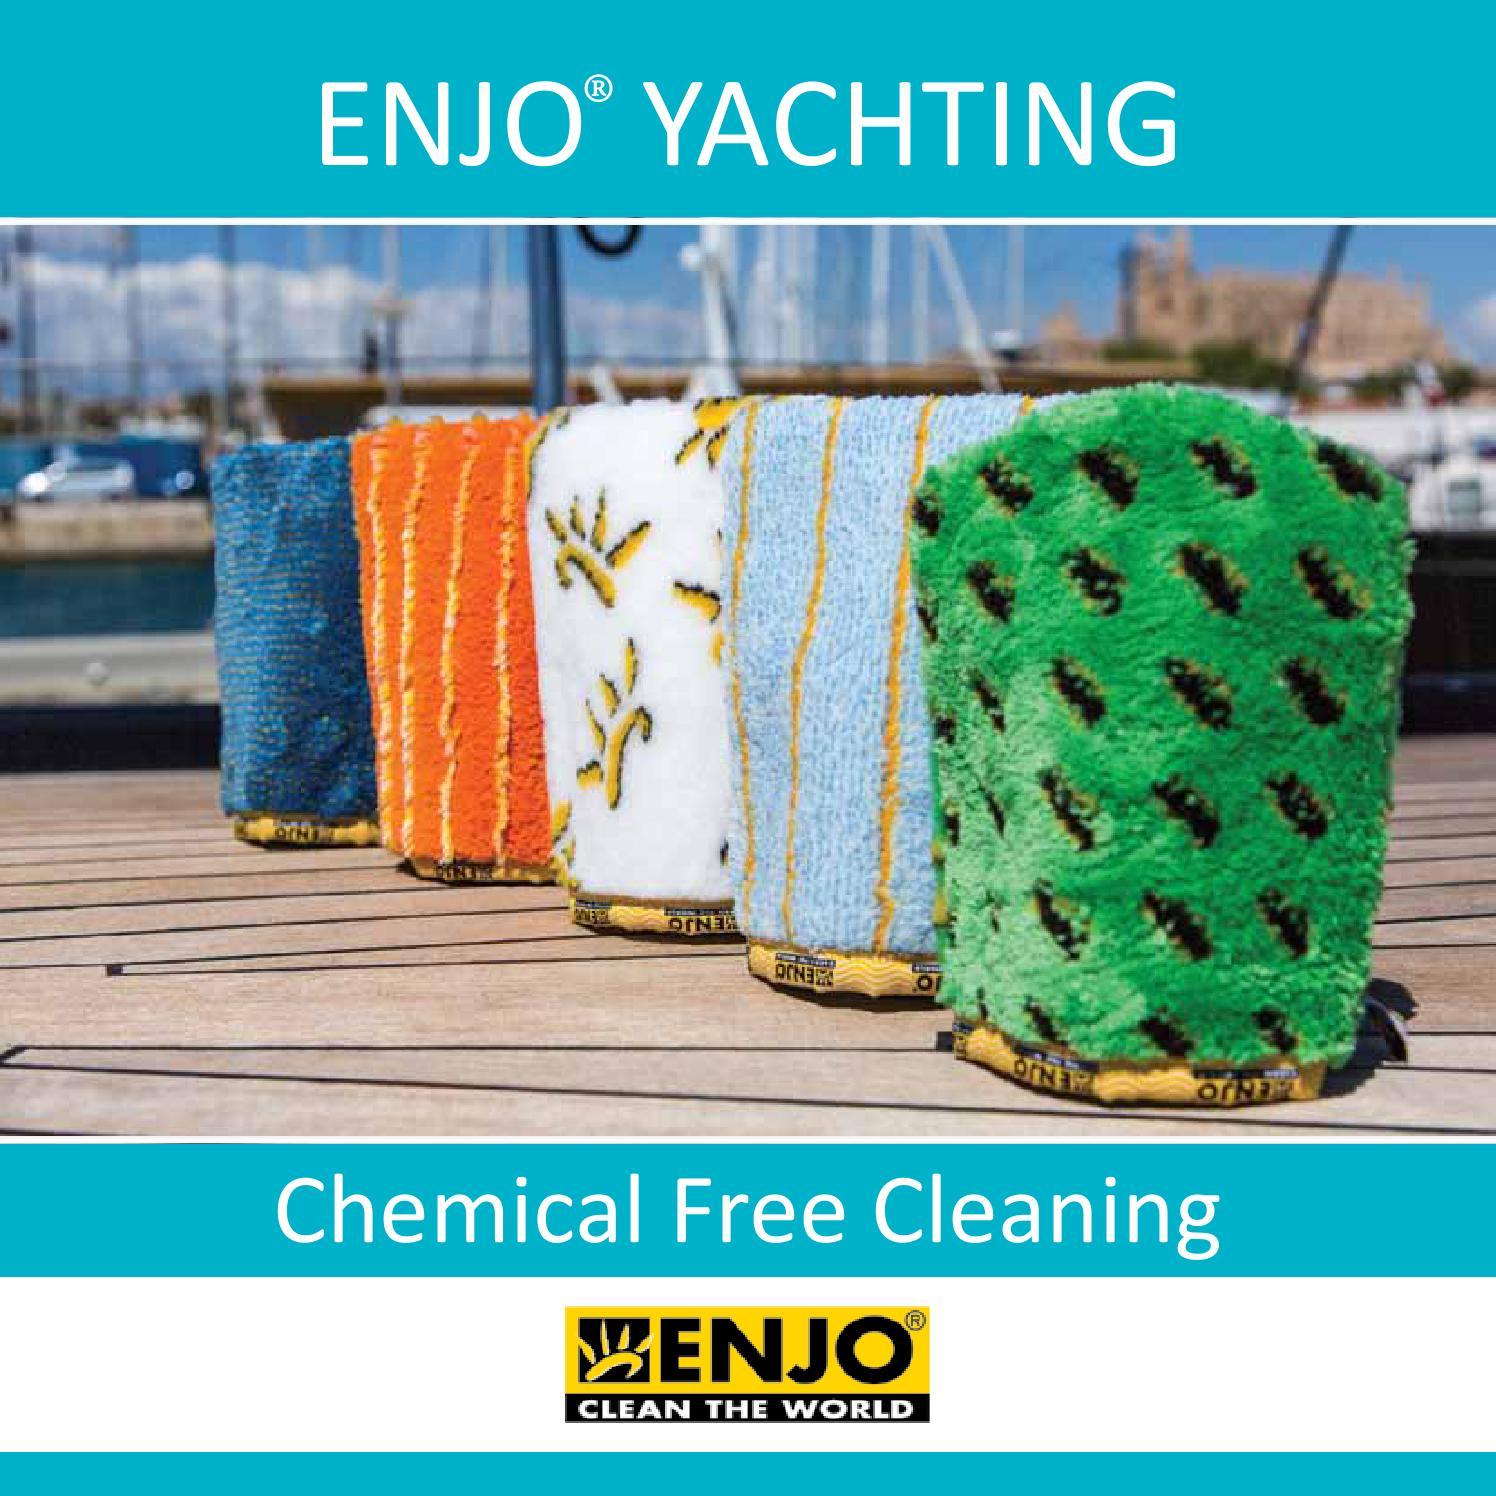 Wash Enjo Cloths: Enjo® Yachting Brochure 2013 By Enjoyachtclean